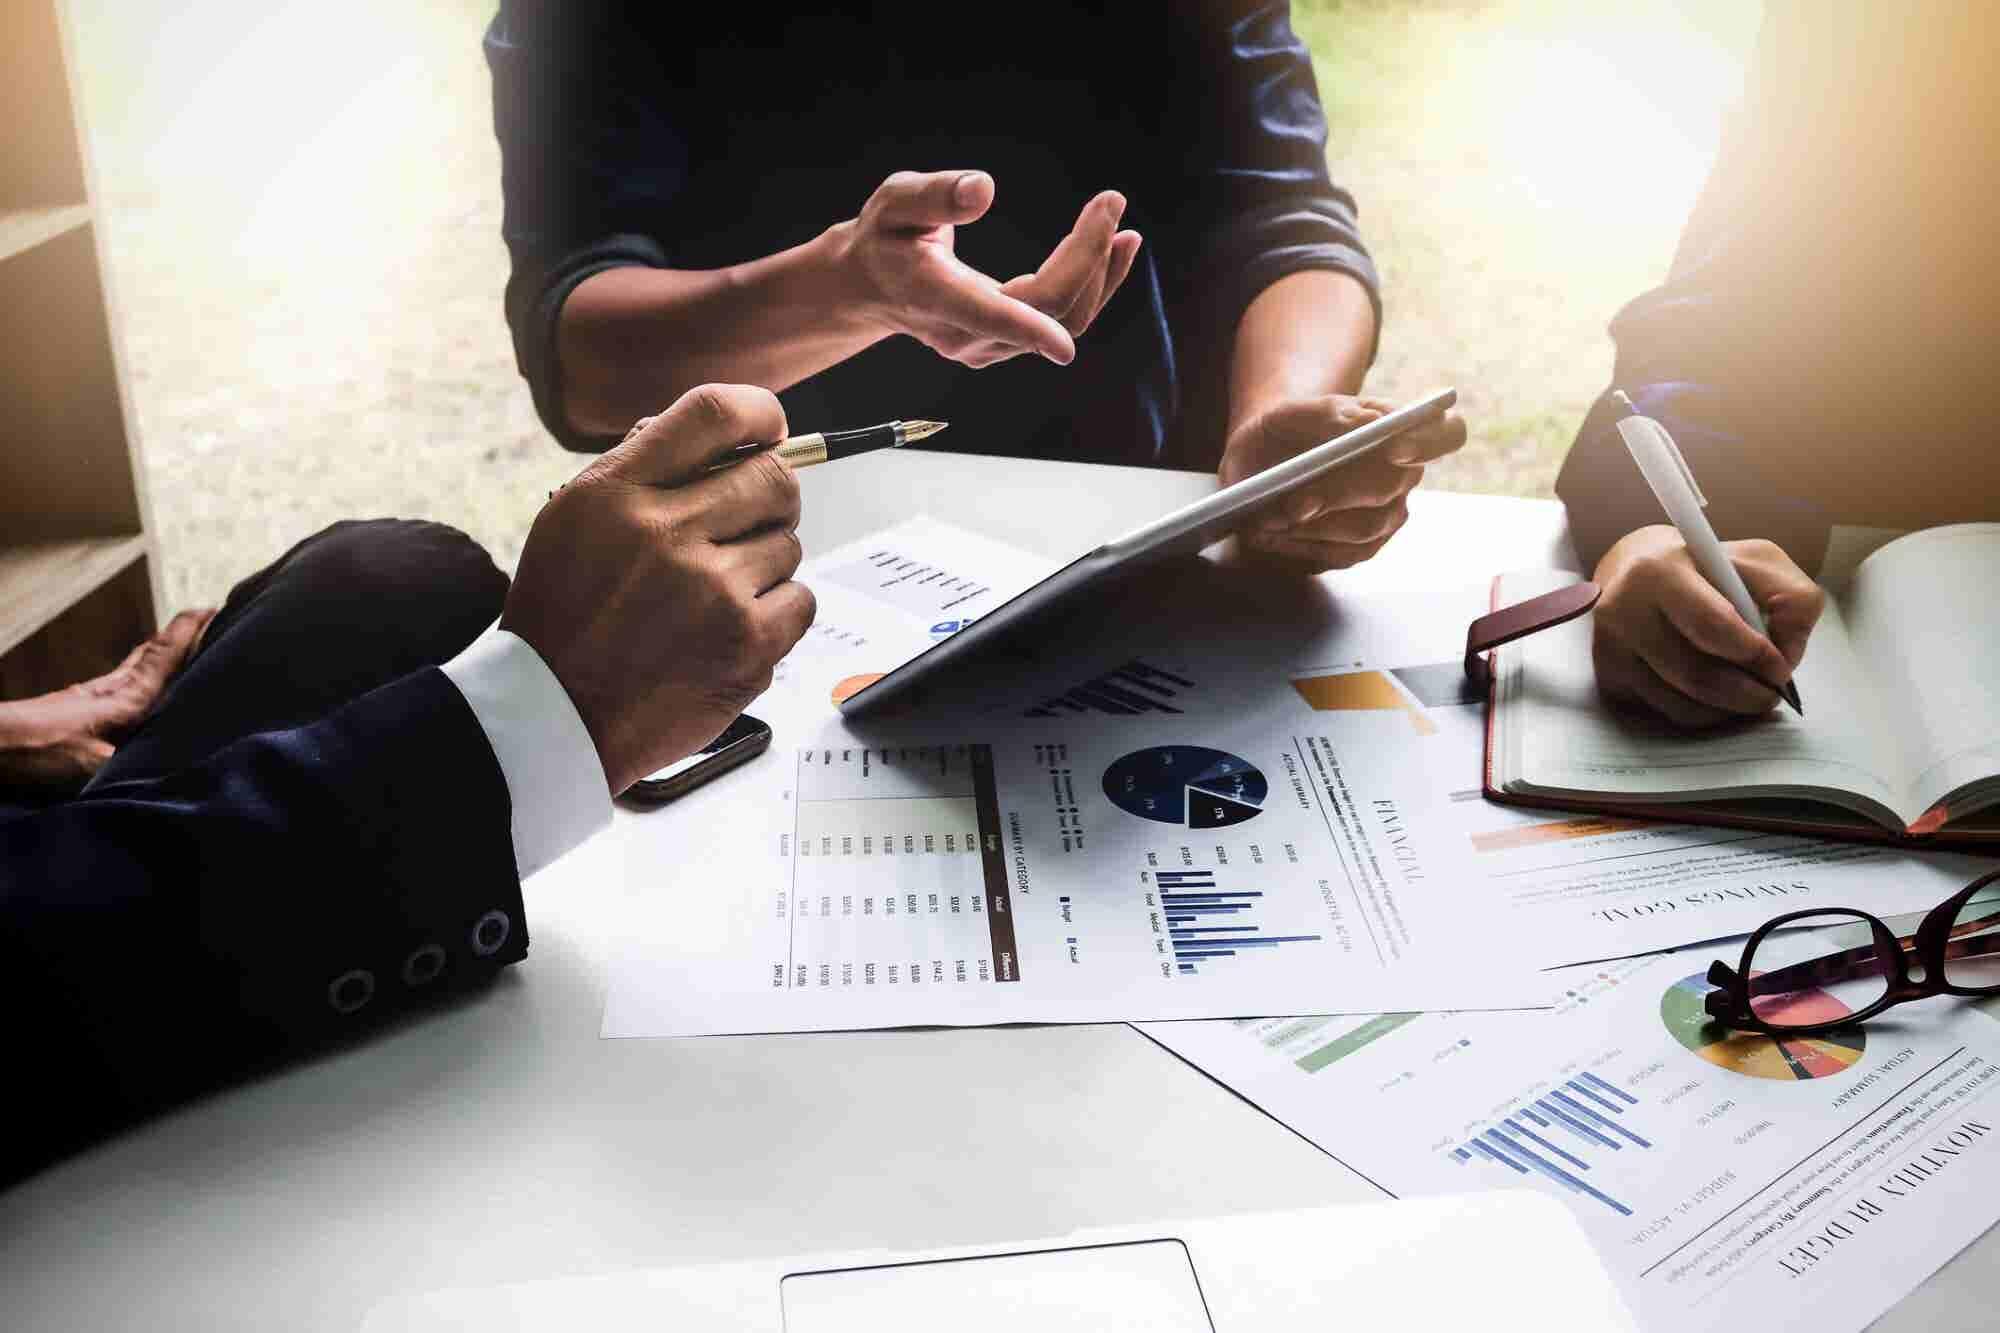 5 Reasons Every Entrepreneur Should Start in Sales